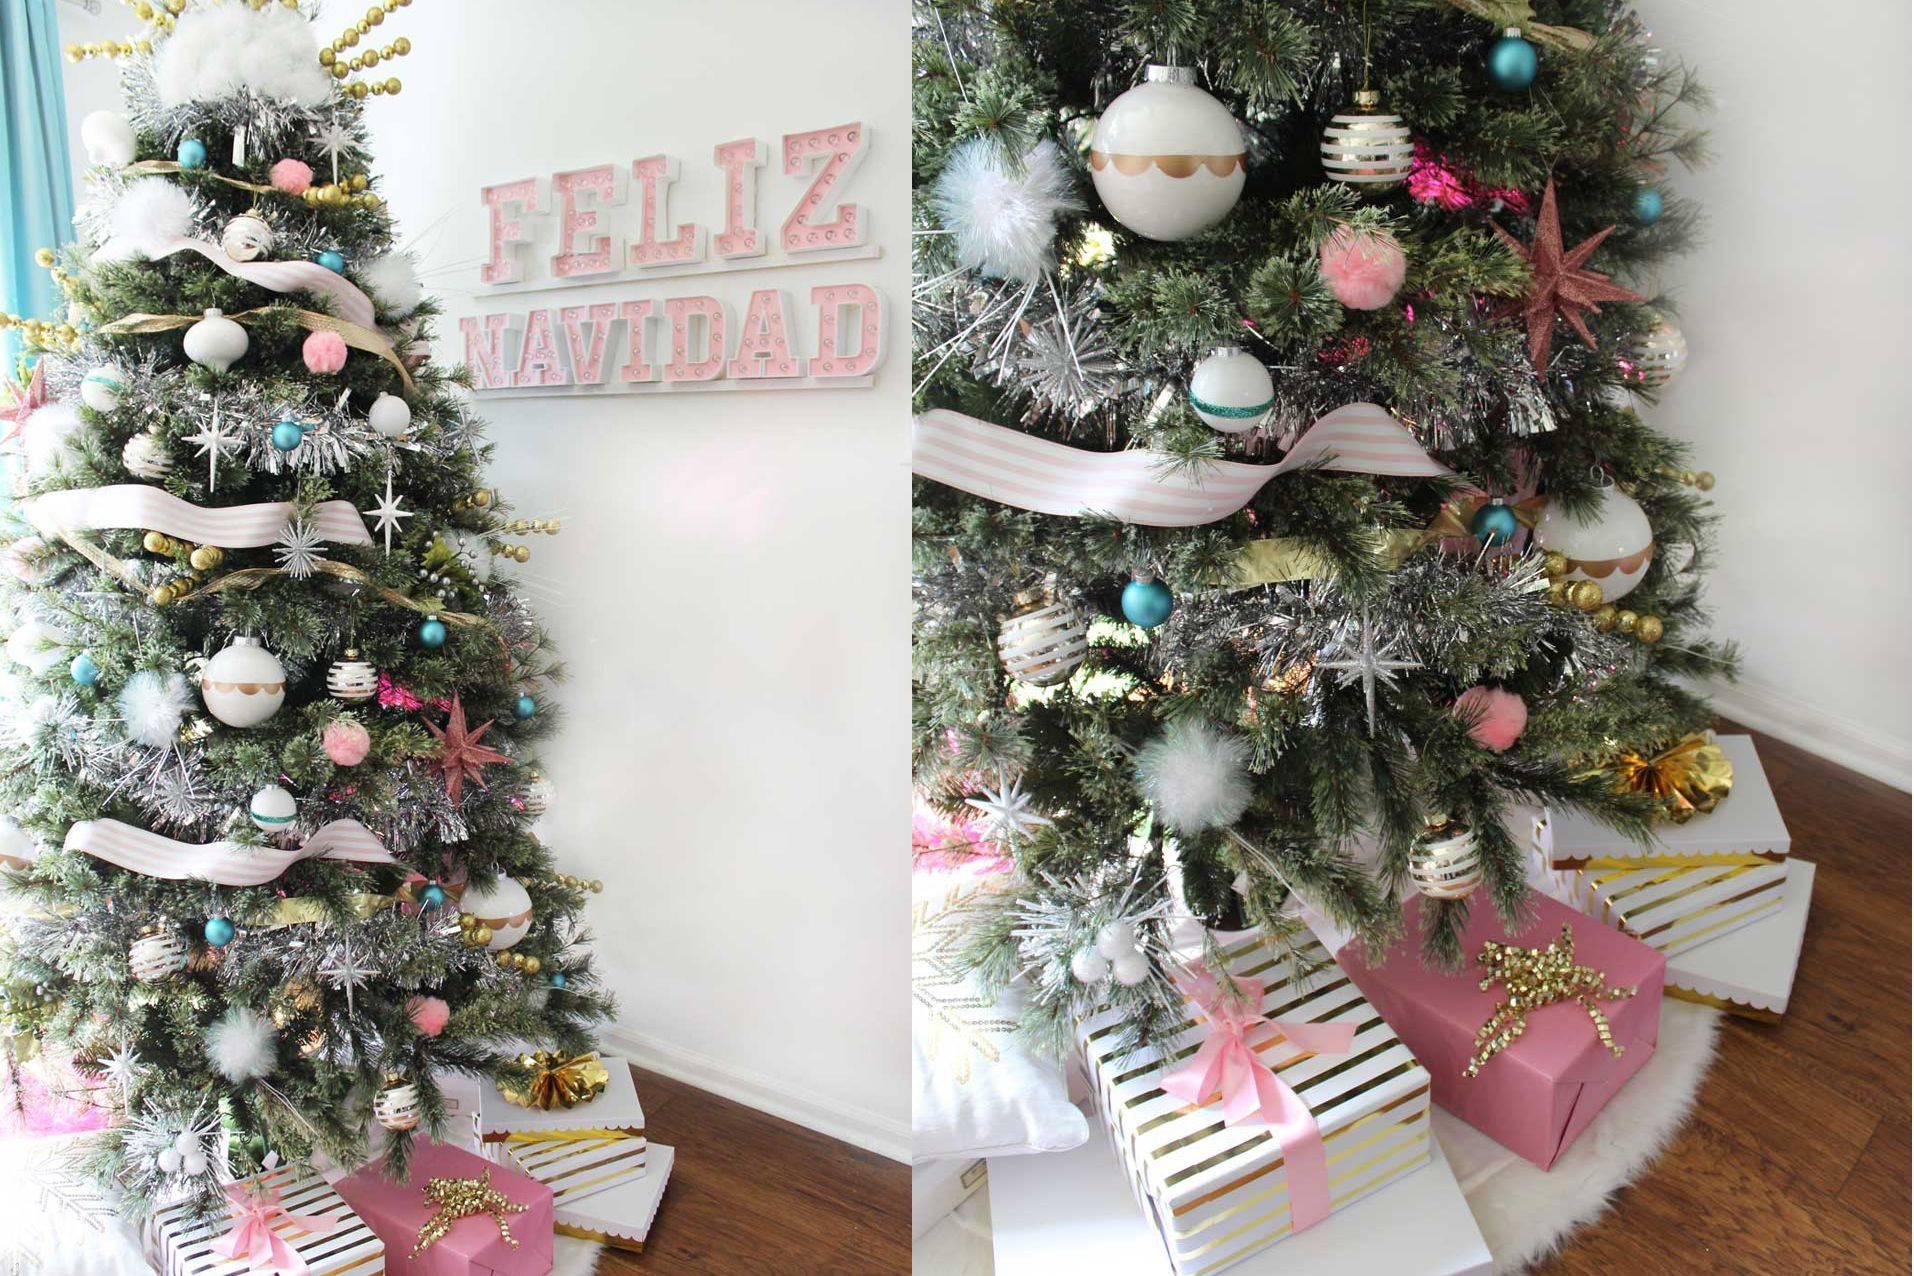 fin 22 feliz navidad tree pastels 59dfe9439abed ffb0